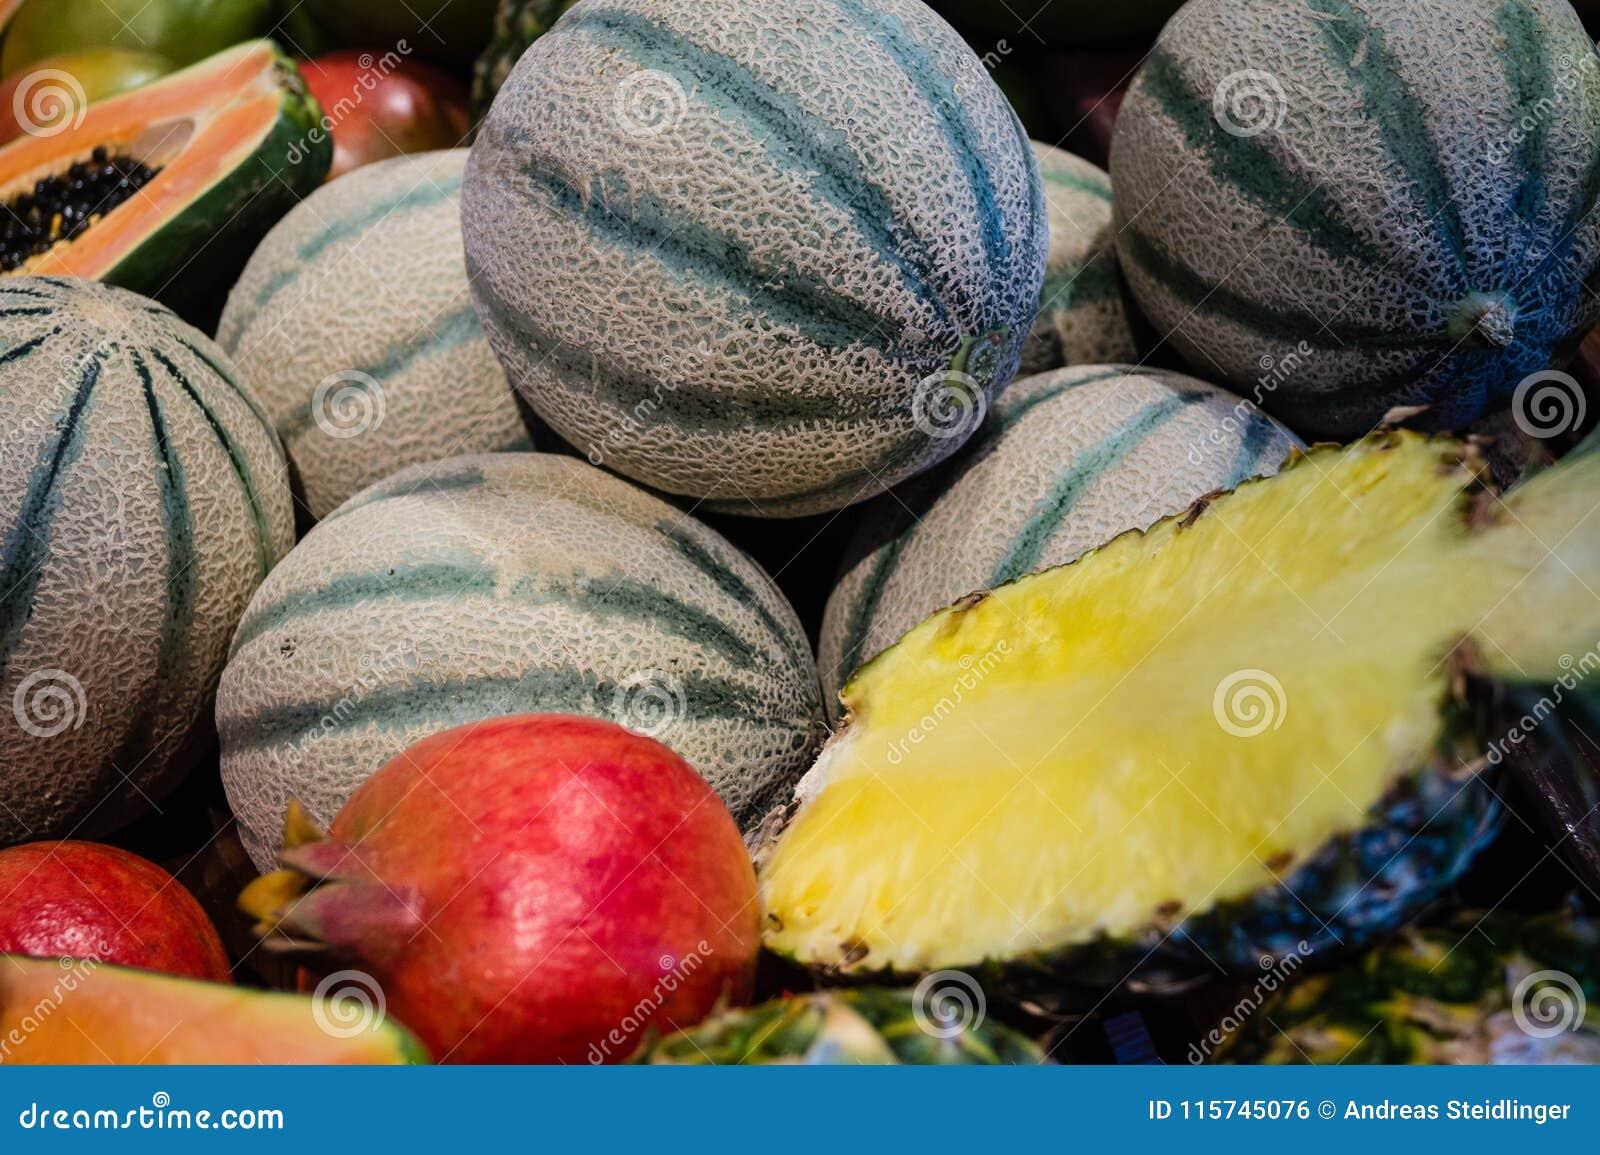 Fruits on a market